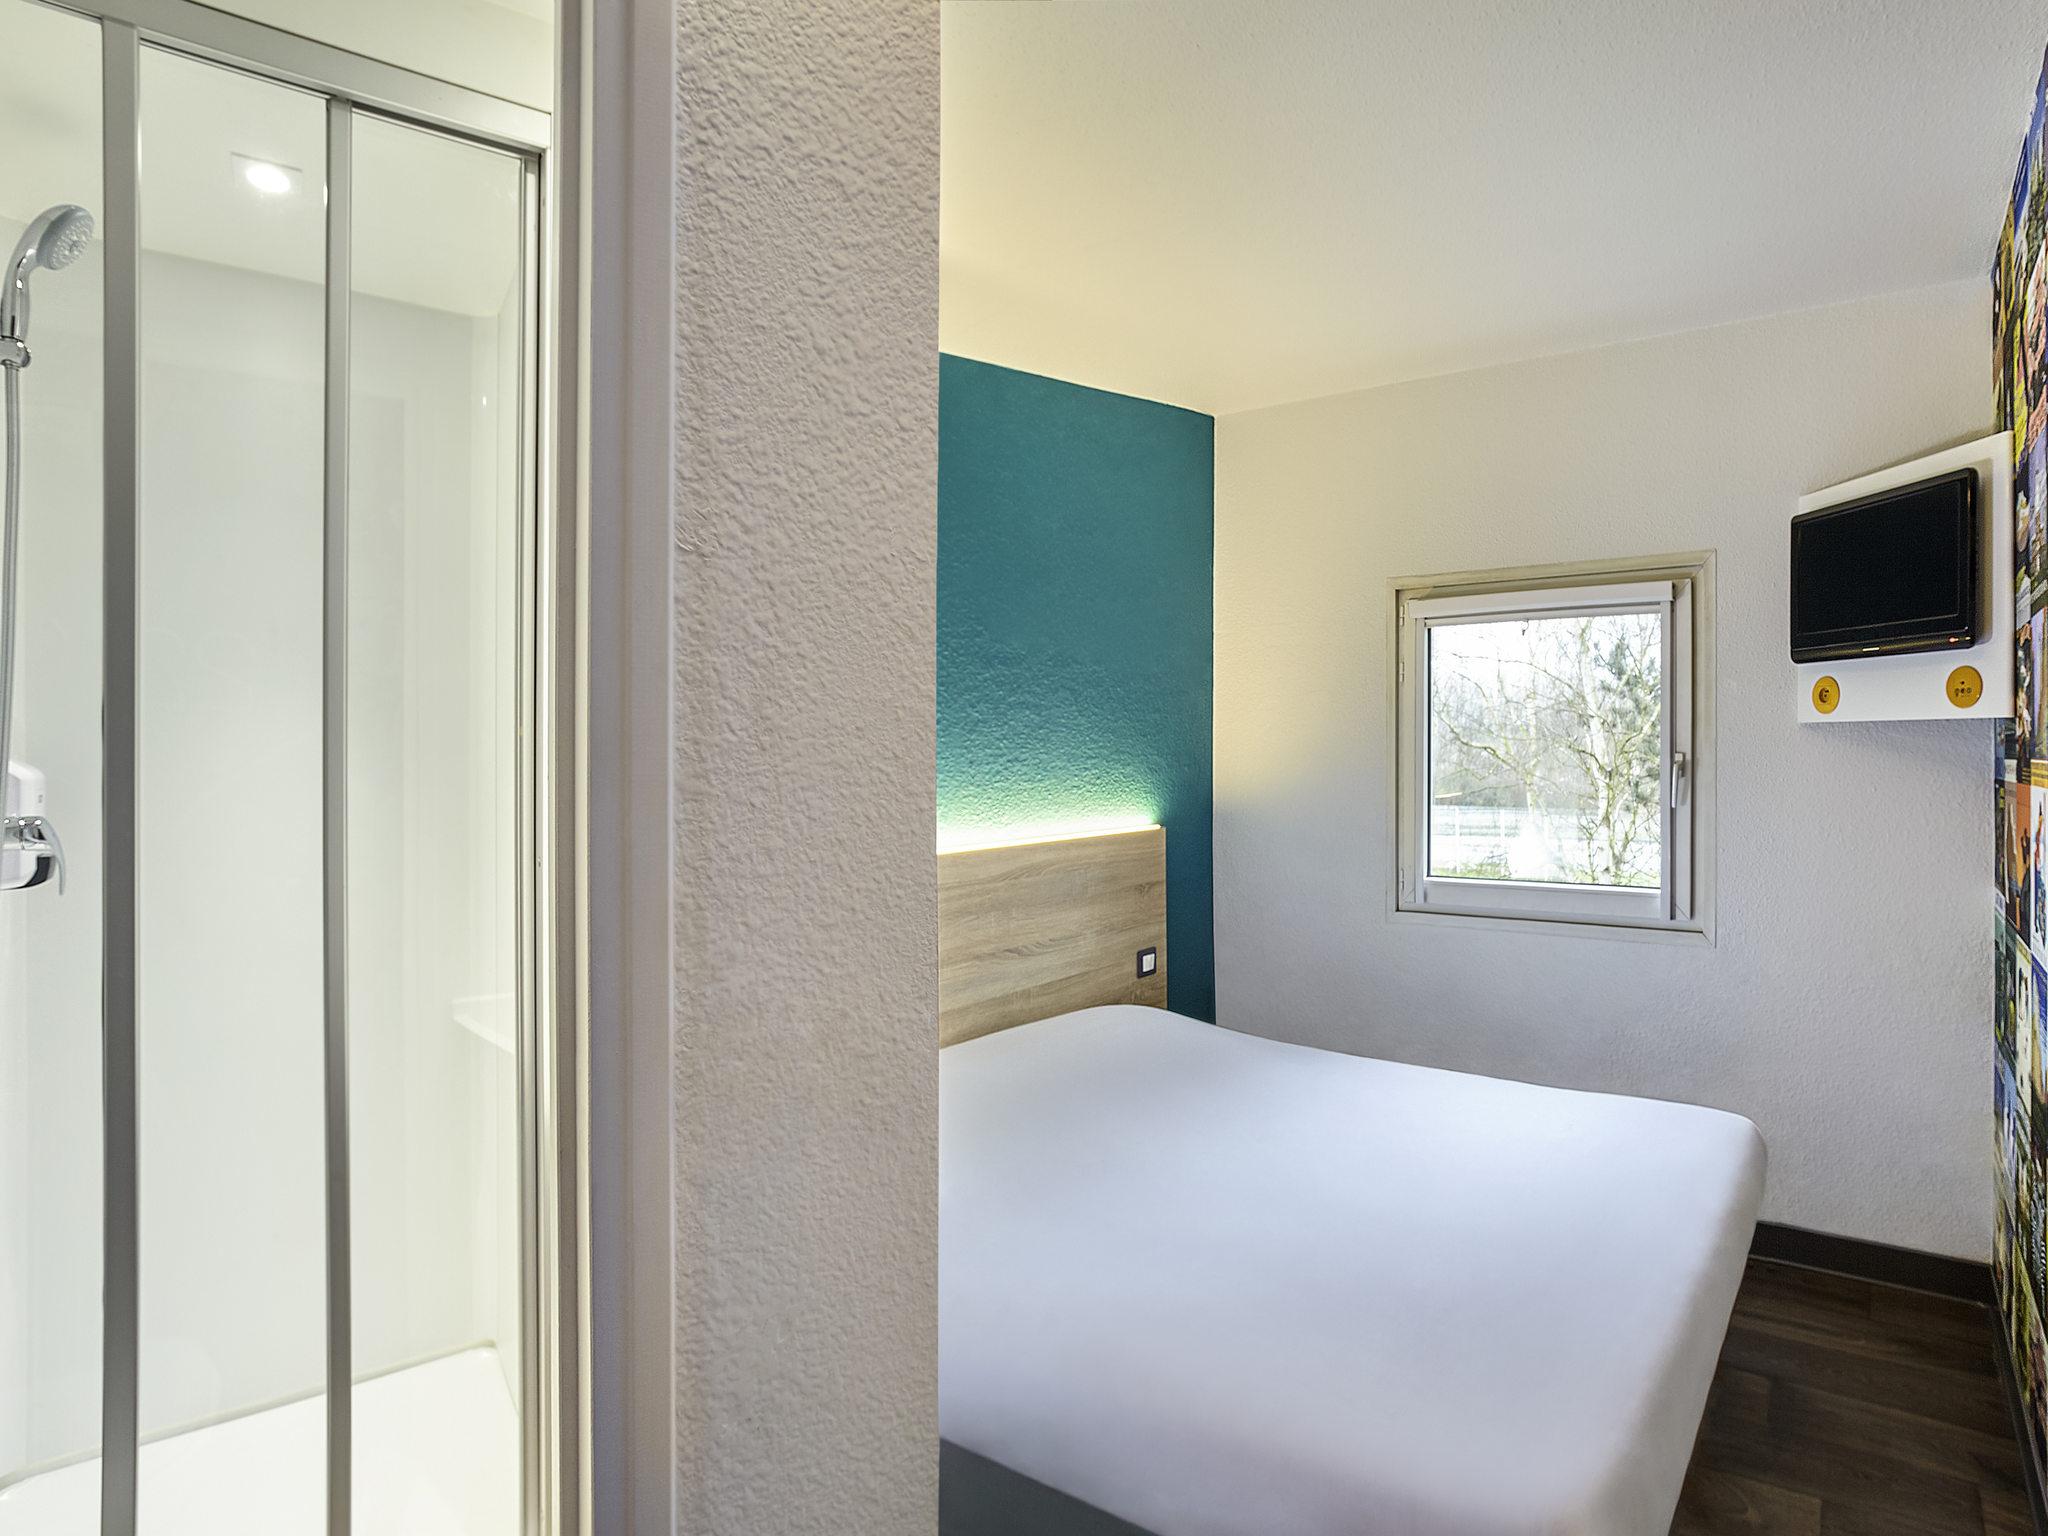 Отель — hotelF1 Béziers Est (rénové)